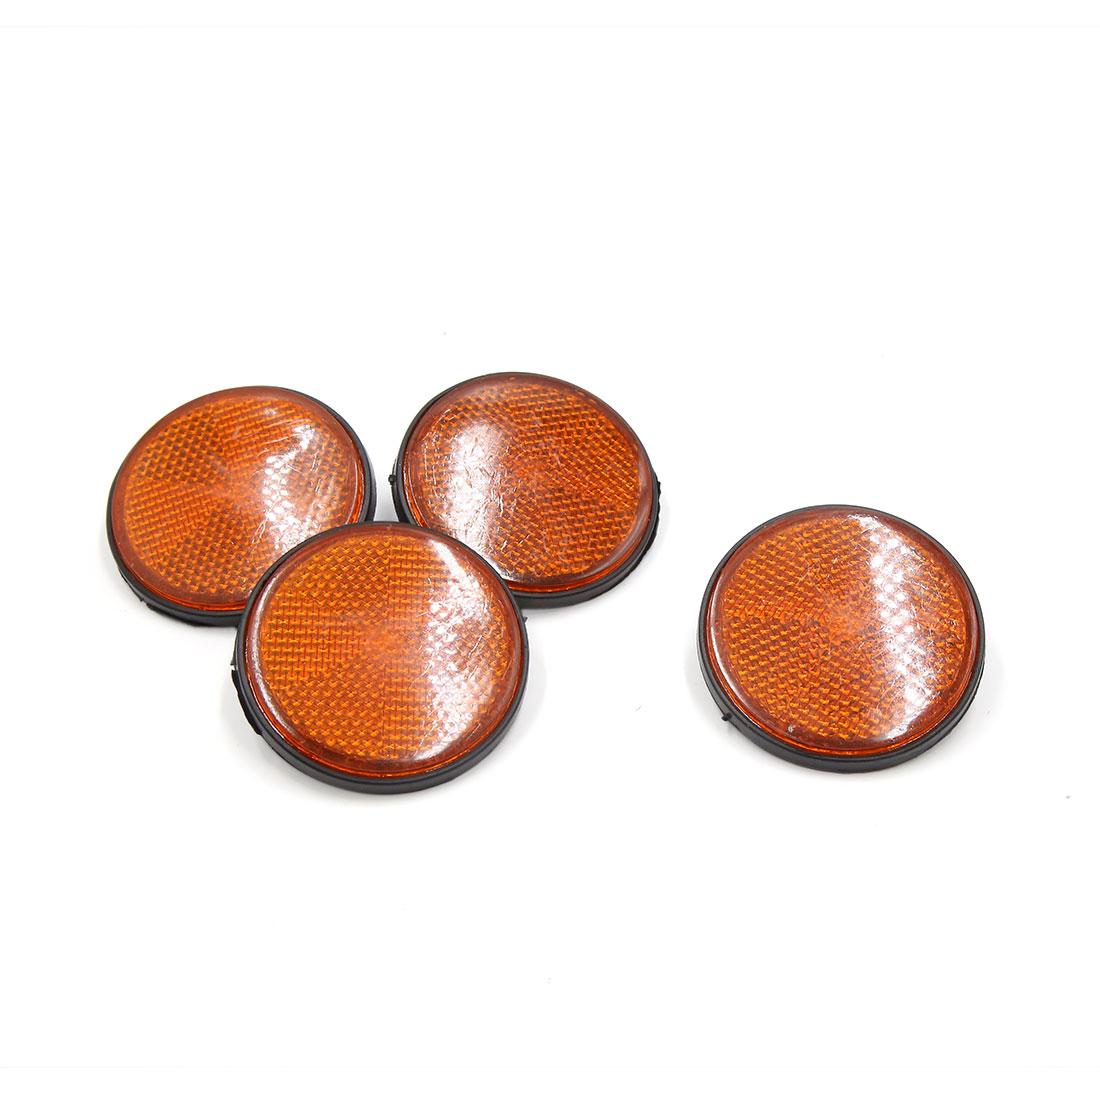 4 Pcs 56mm Dia Orange Black Plastic Round Reflective Warning Plate Reflector